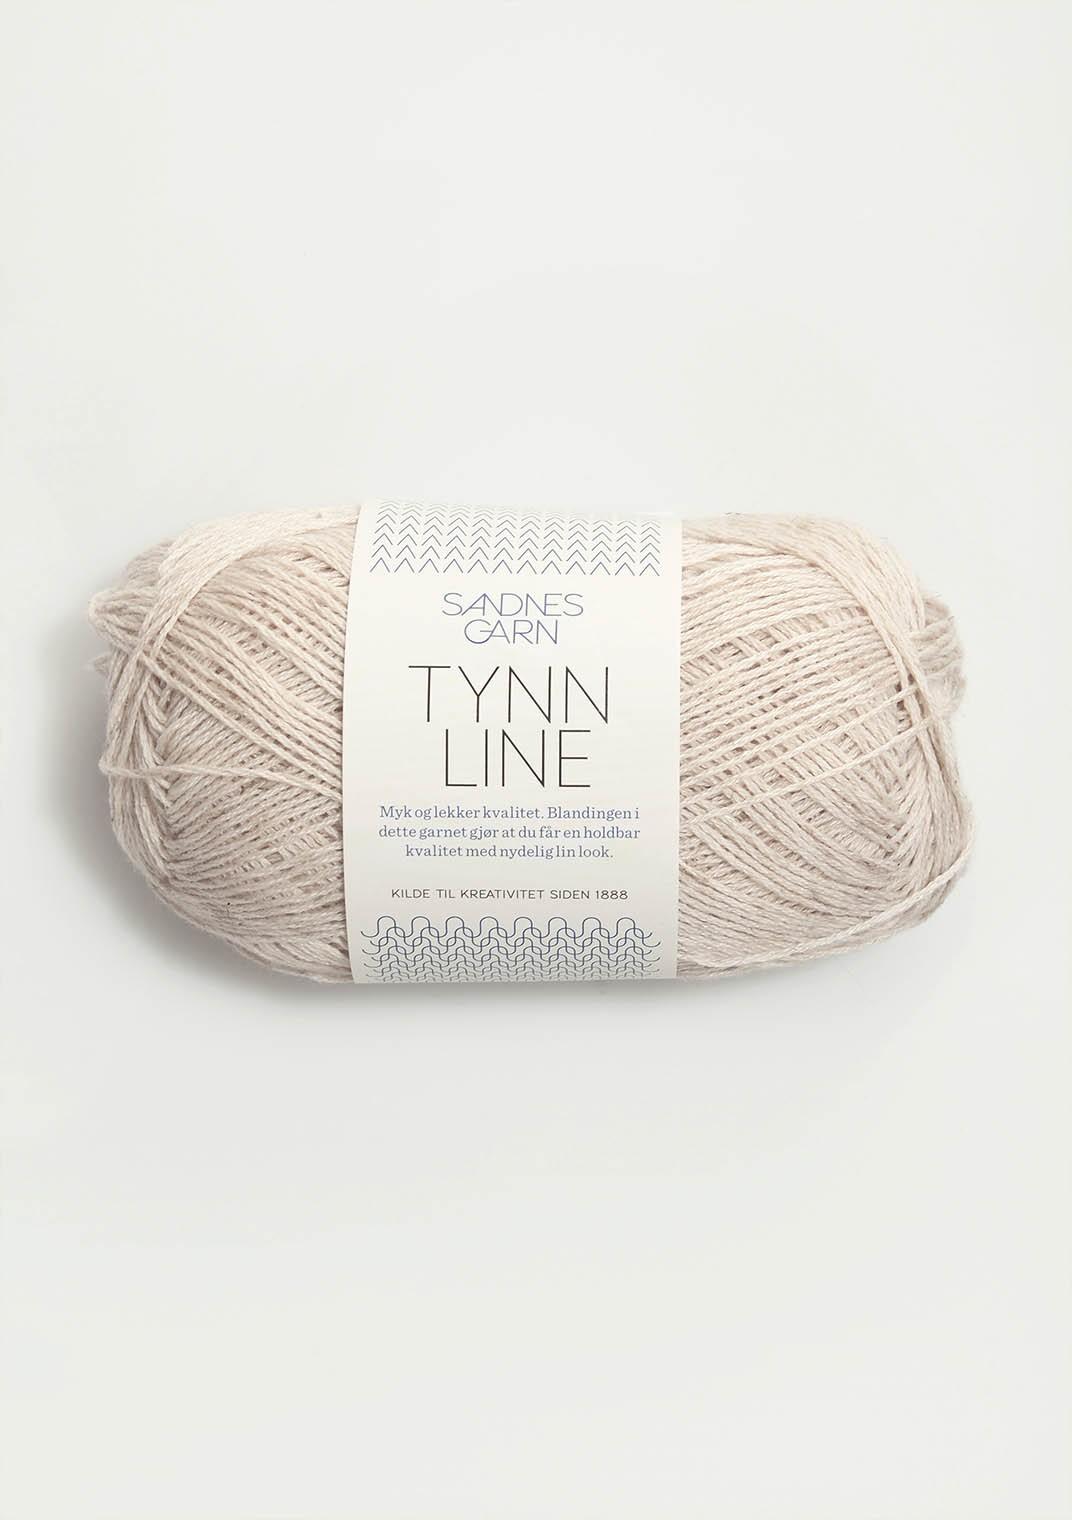 Sandnes tynn line 1015 kit